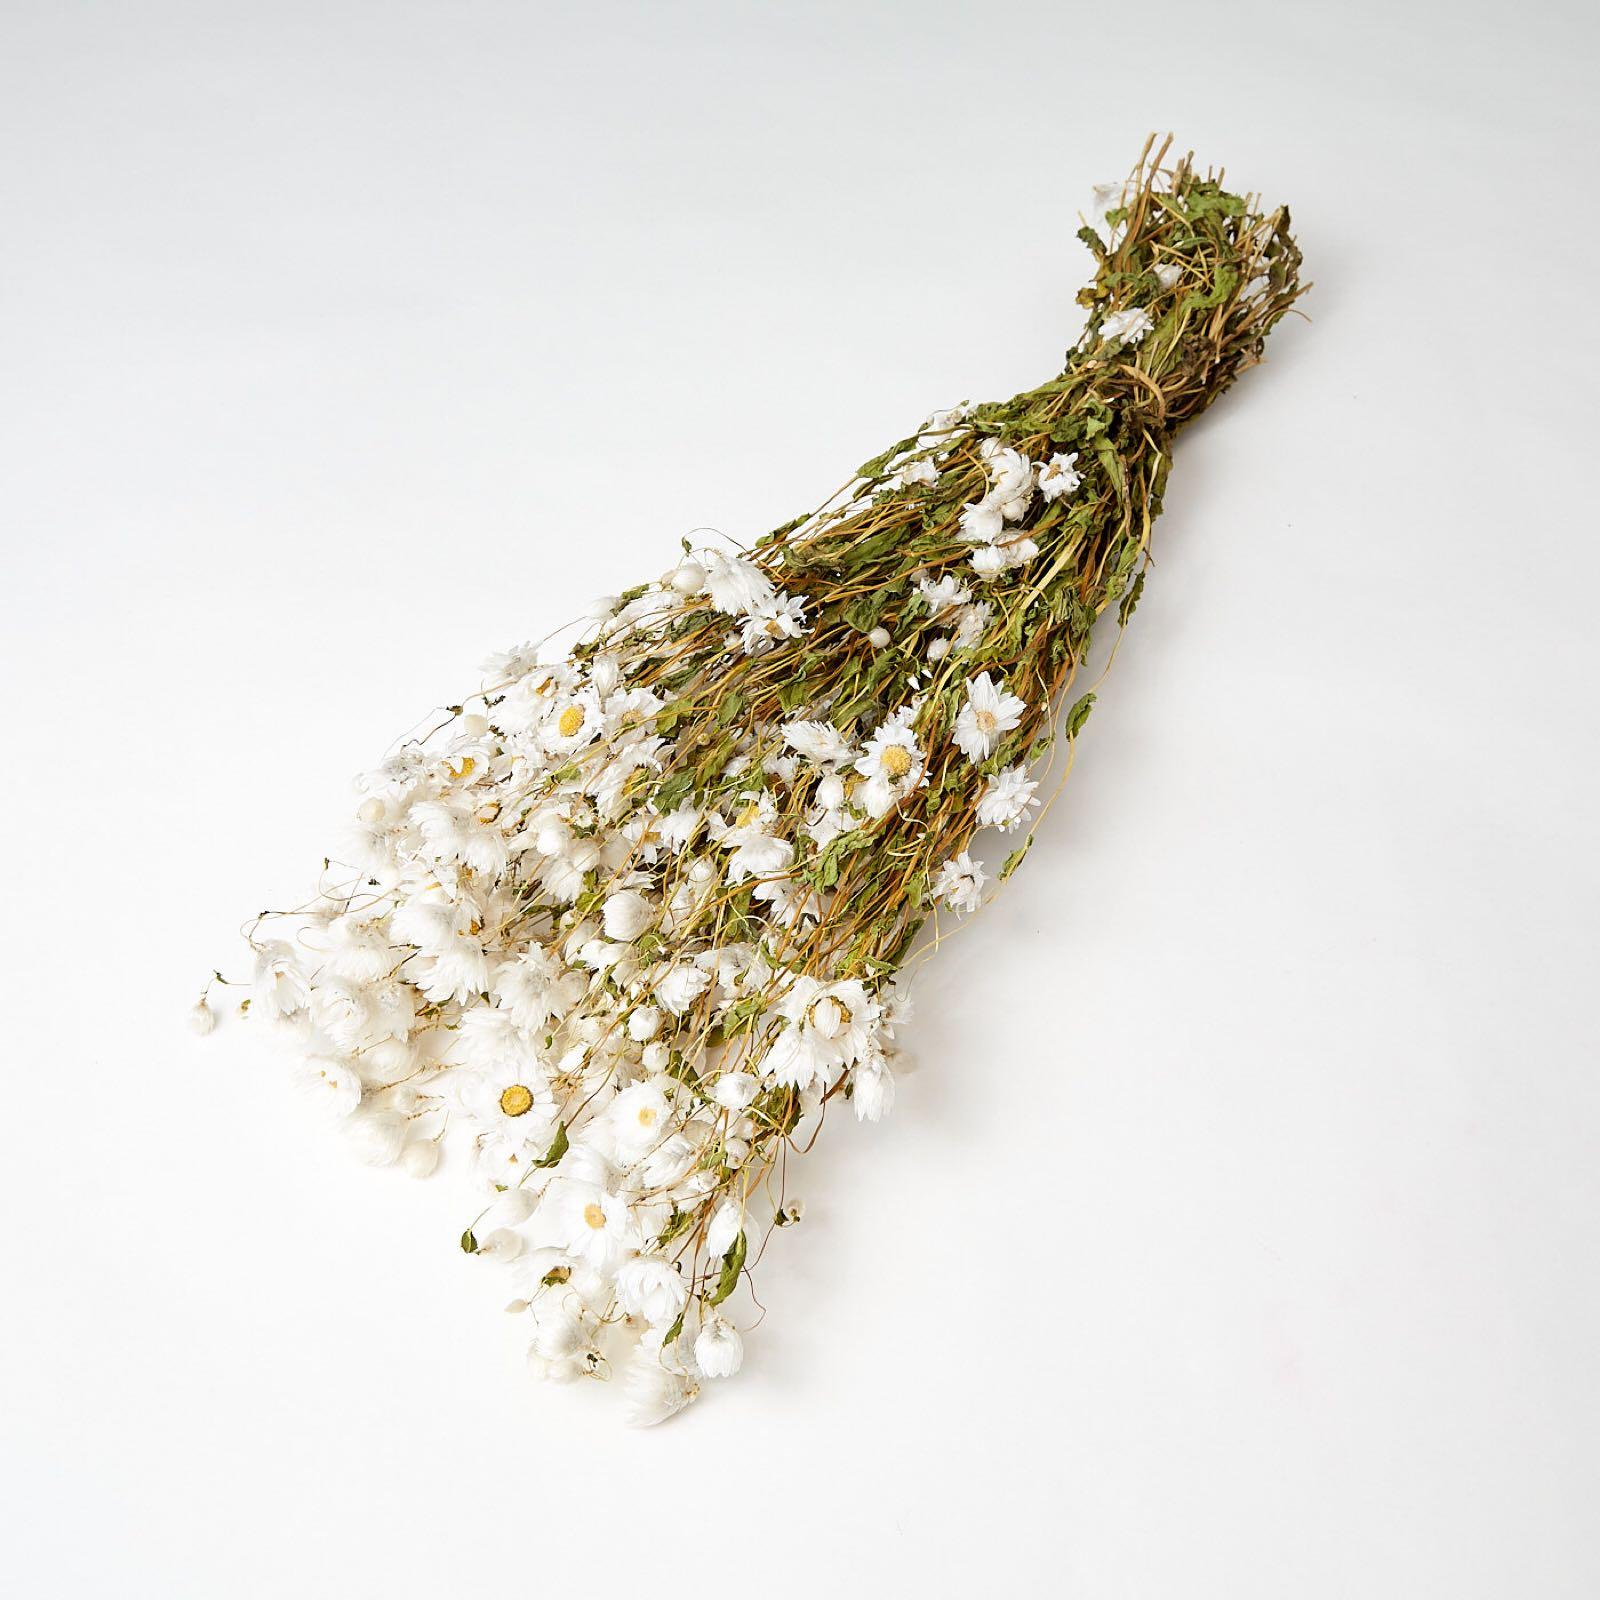 White Rodanthe